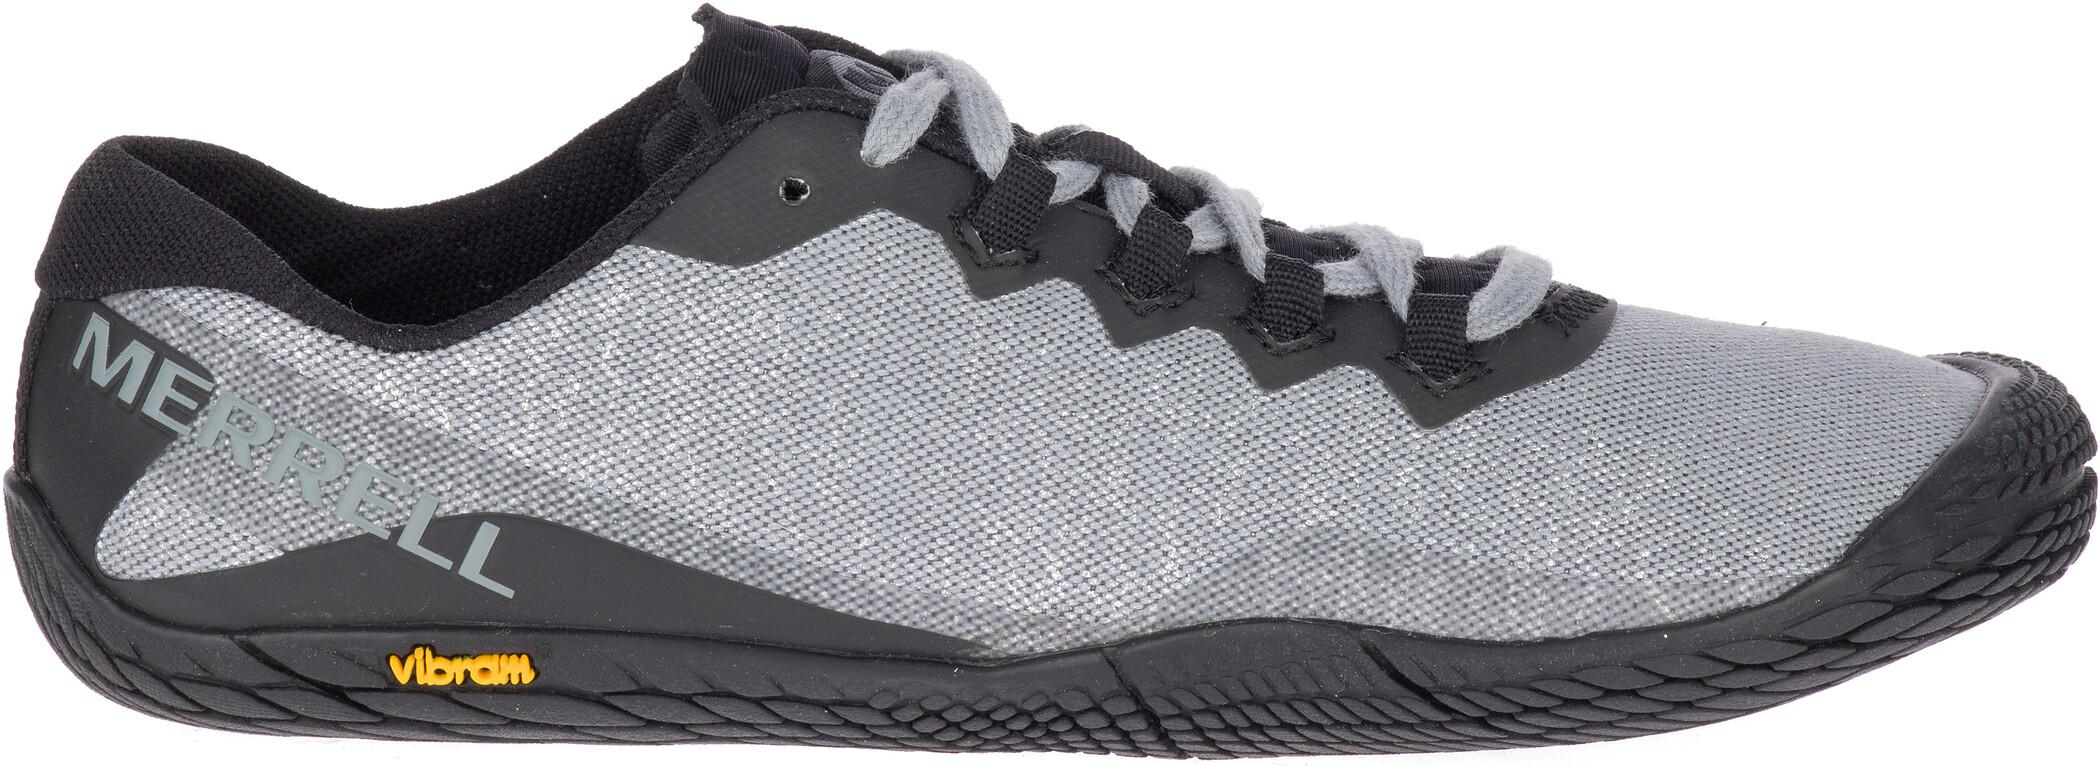 Merrell Vapor Glove 3 Cotton Sko Damer, monument (2019) | Shoes and overlays